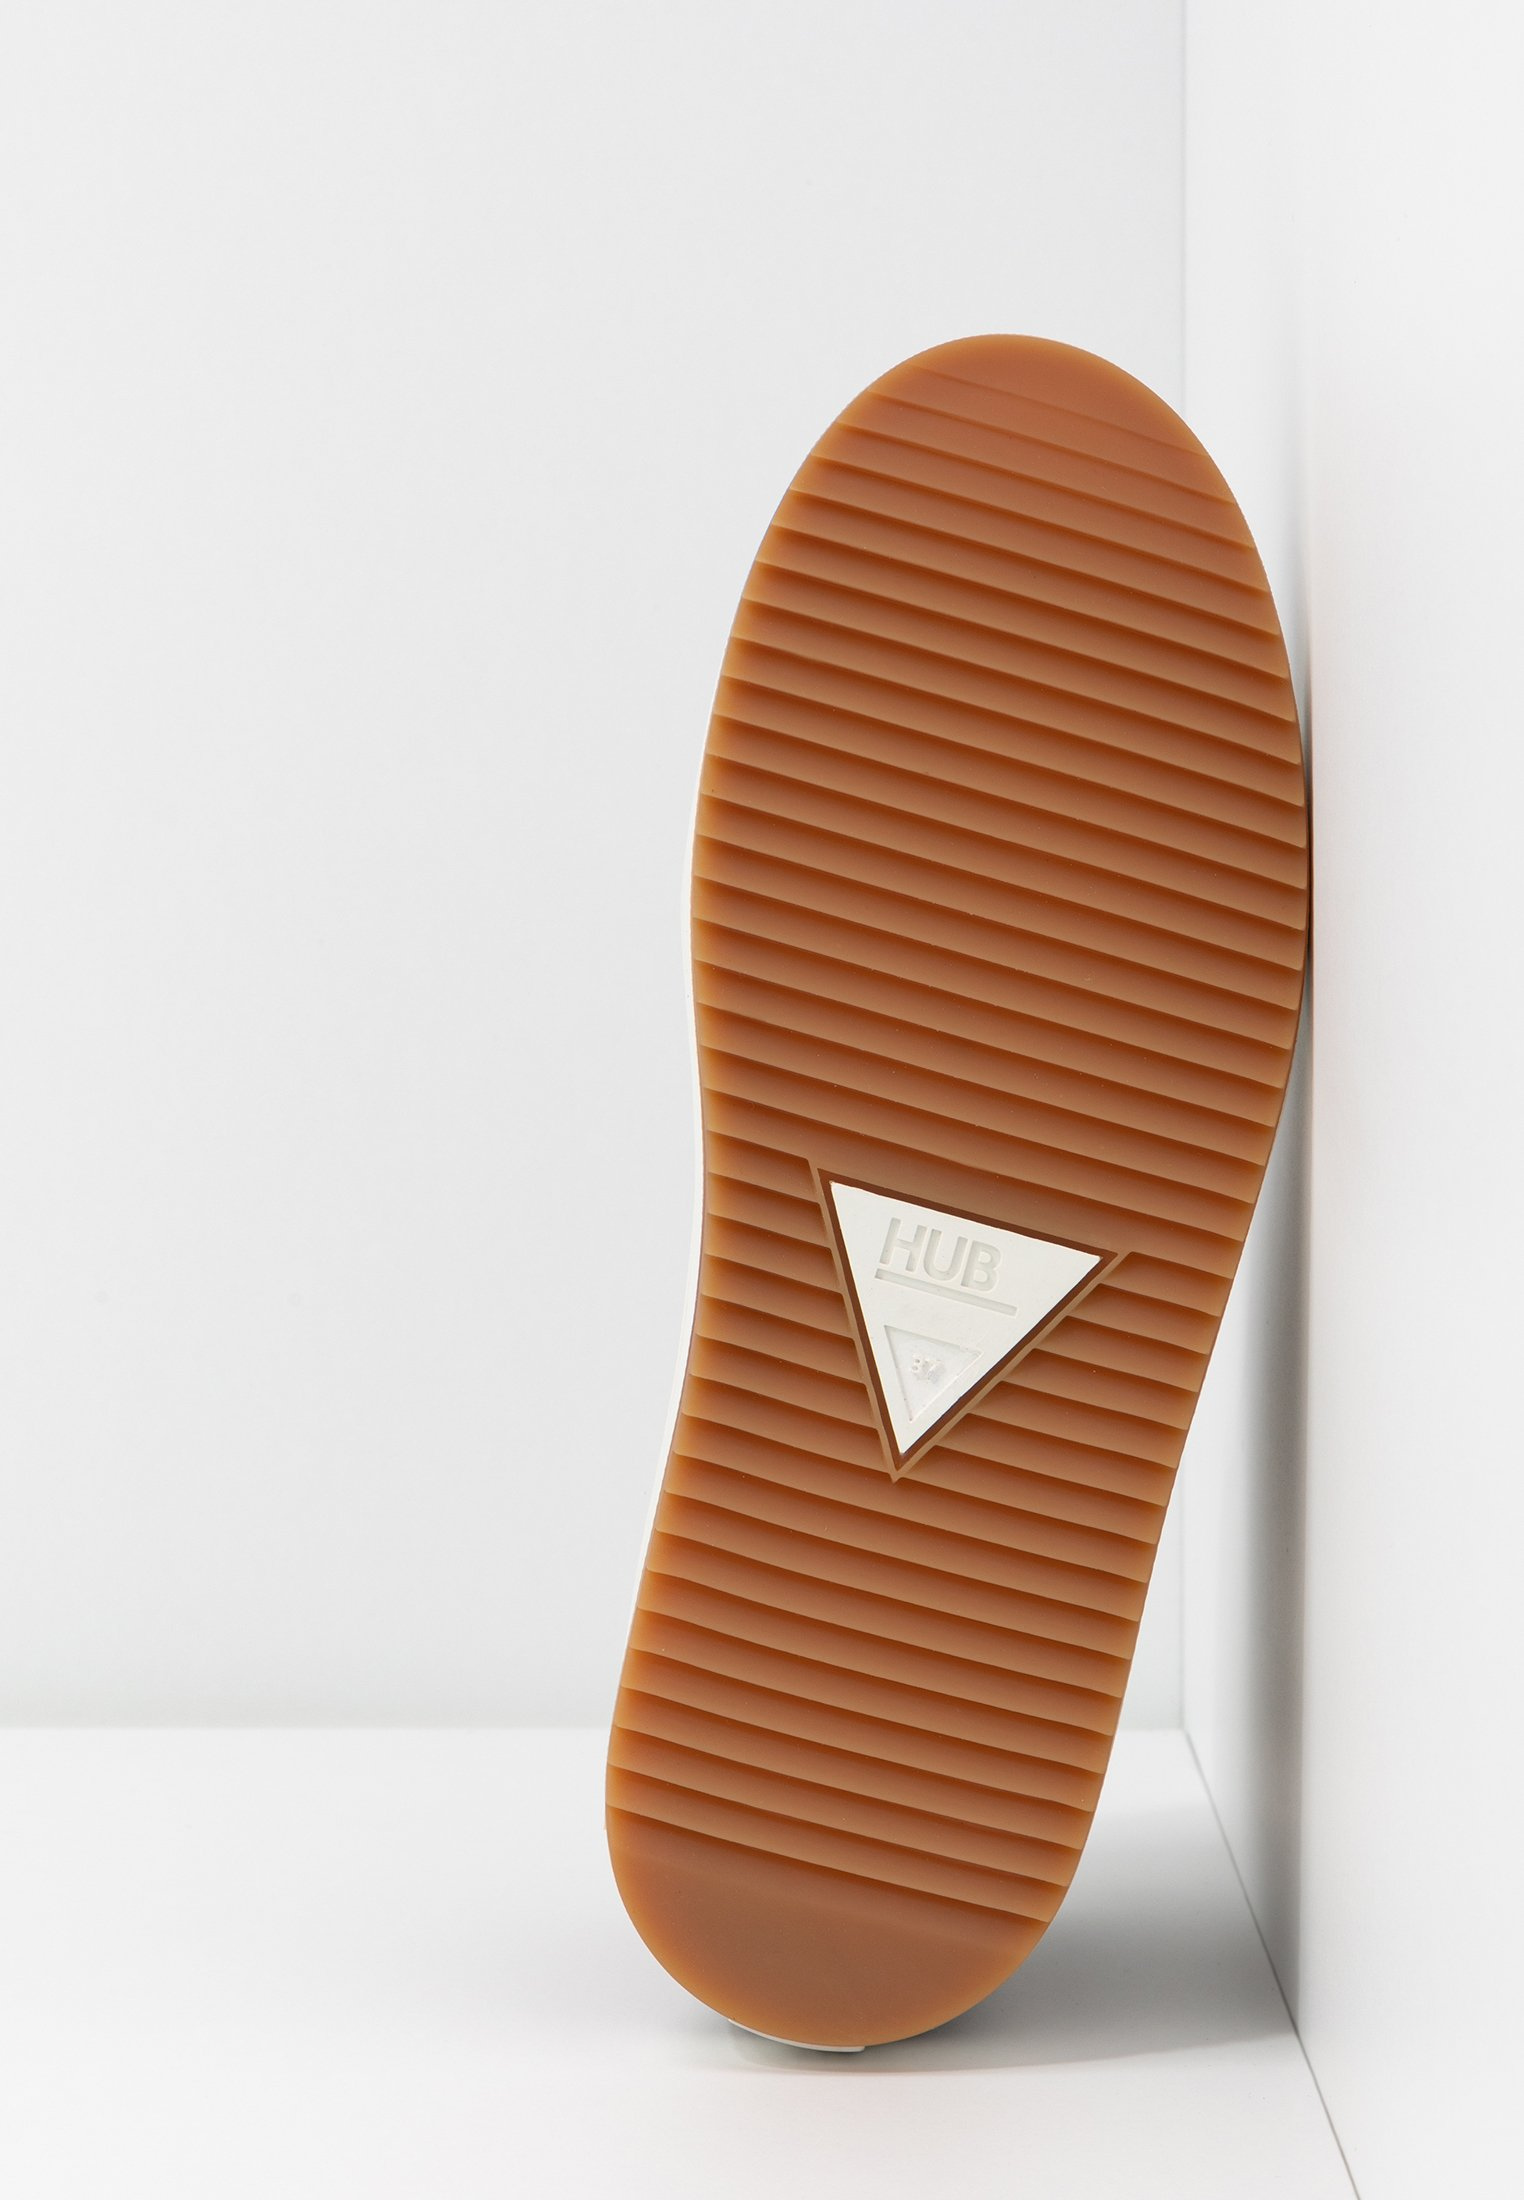 HUB RIDGE Ankle Boot dark brown/offwhite/dunkelbraun